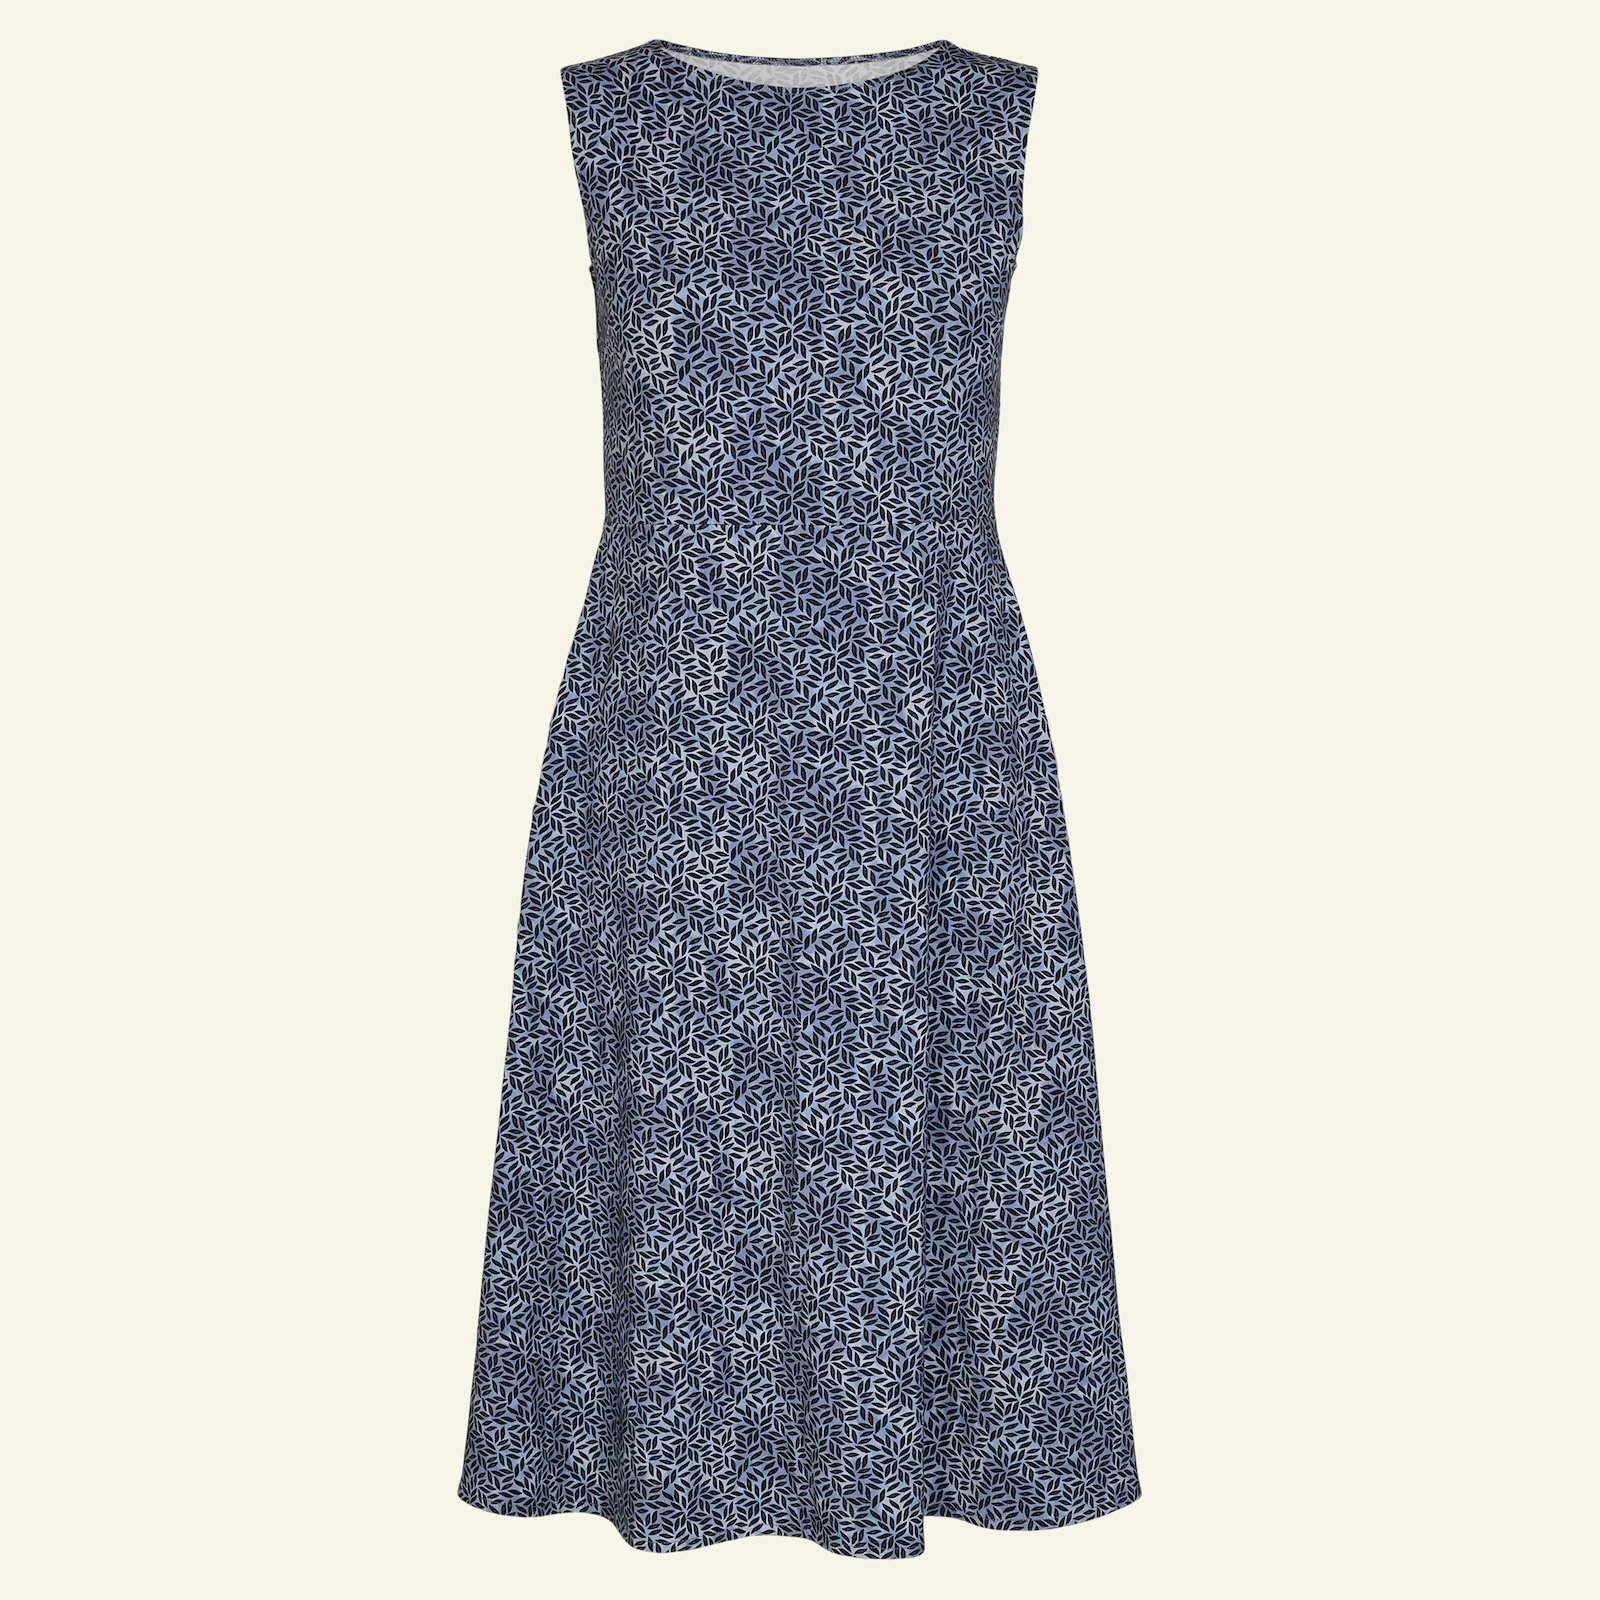 Dress with a full skirt, 46/18 p23154_272689_sskit